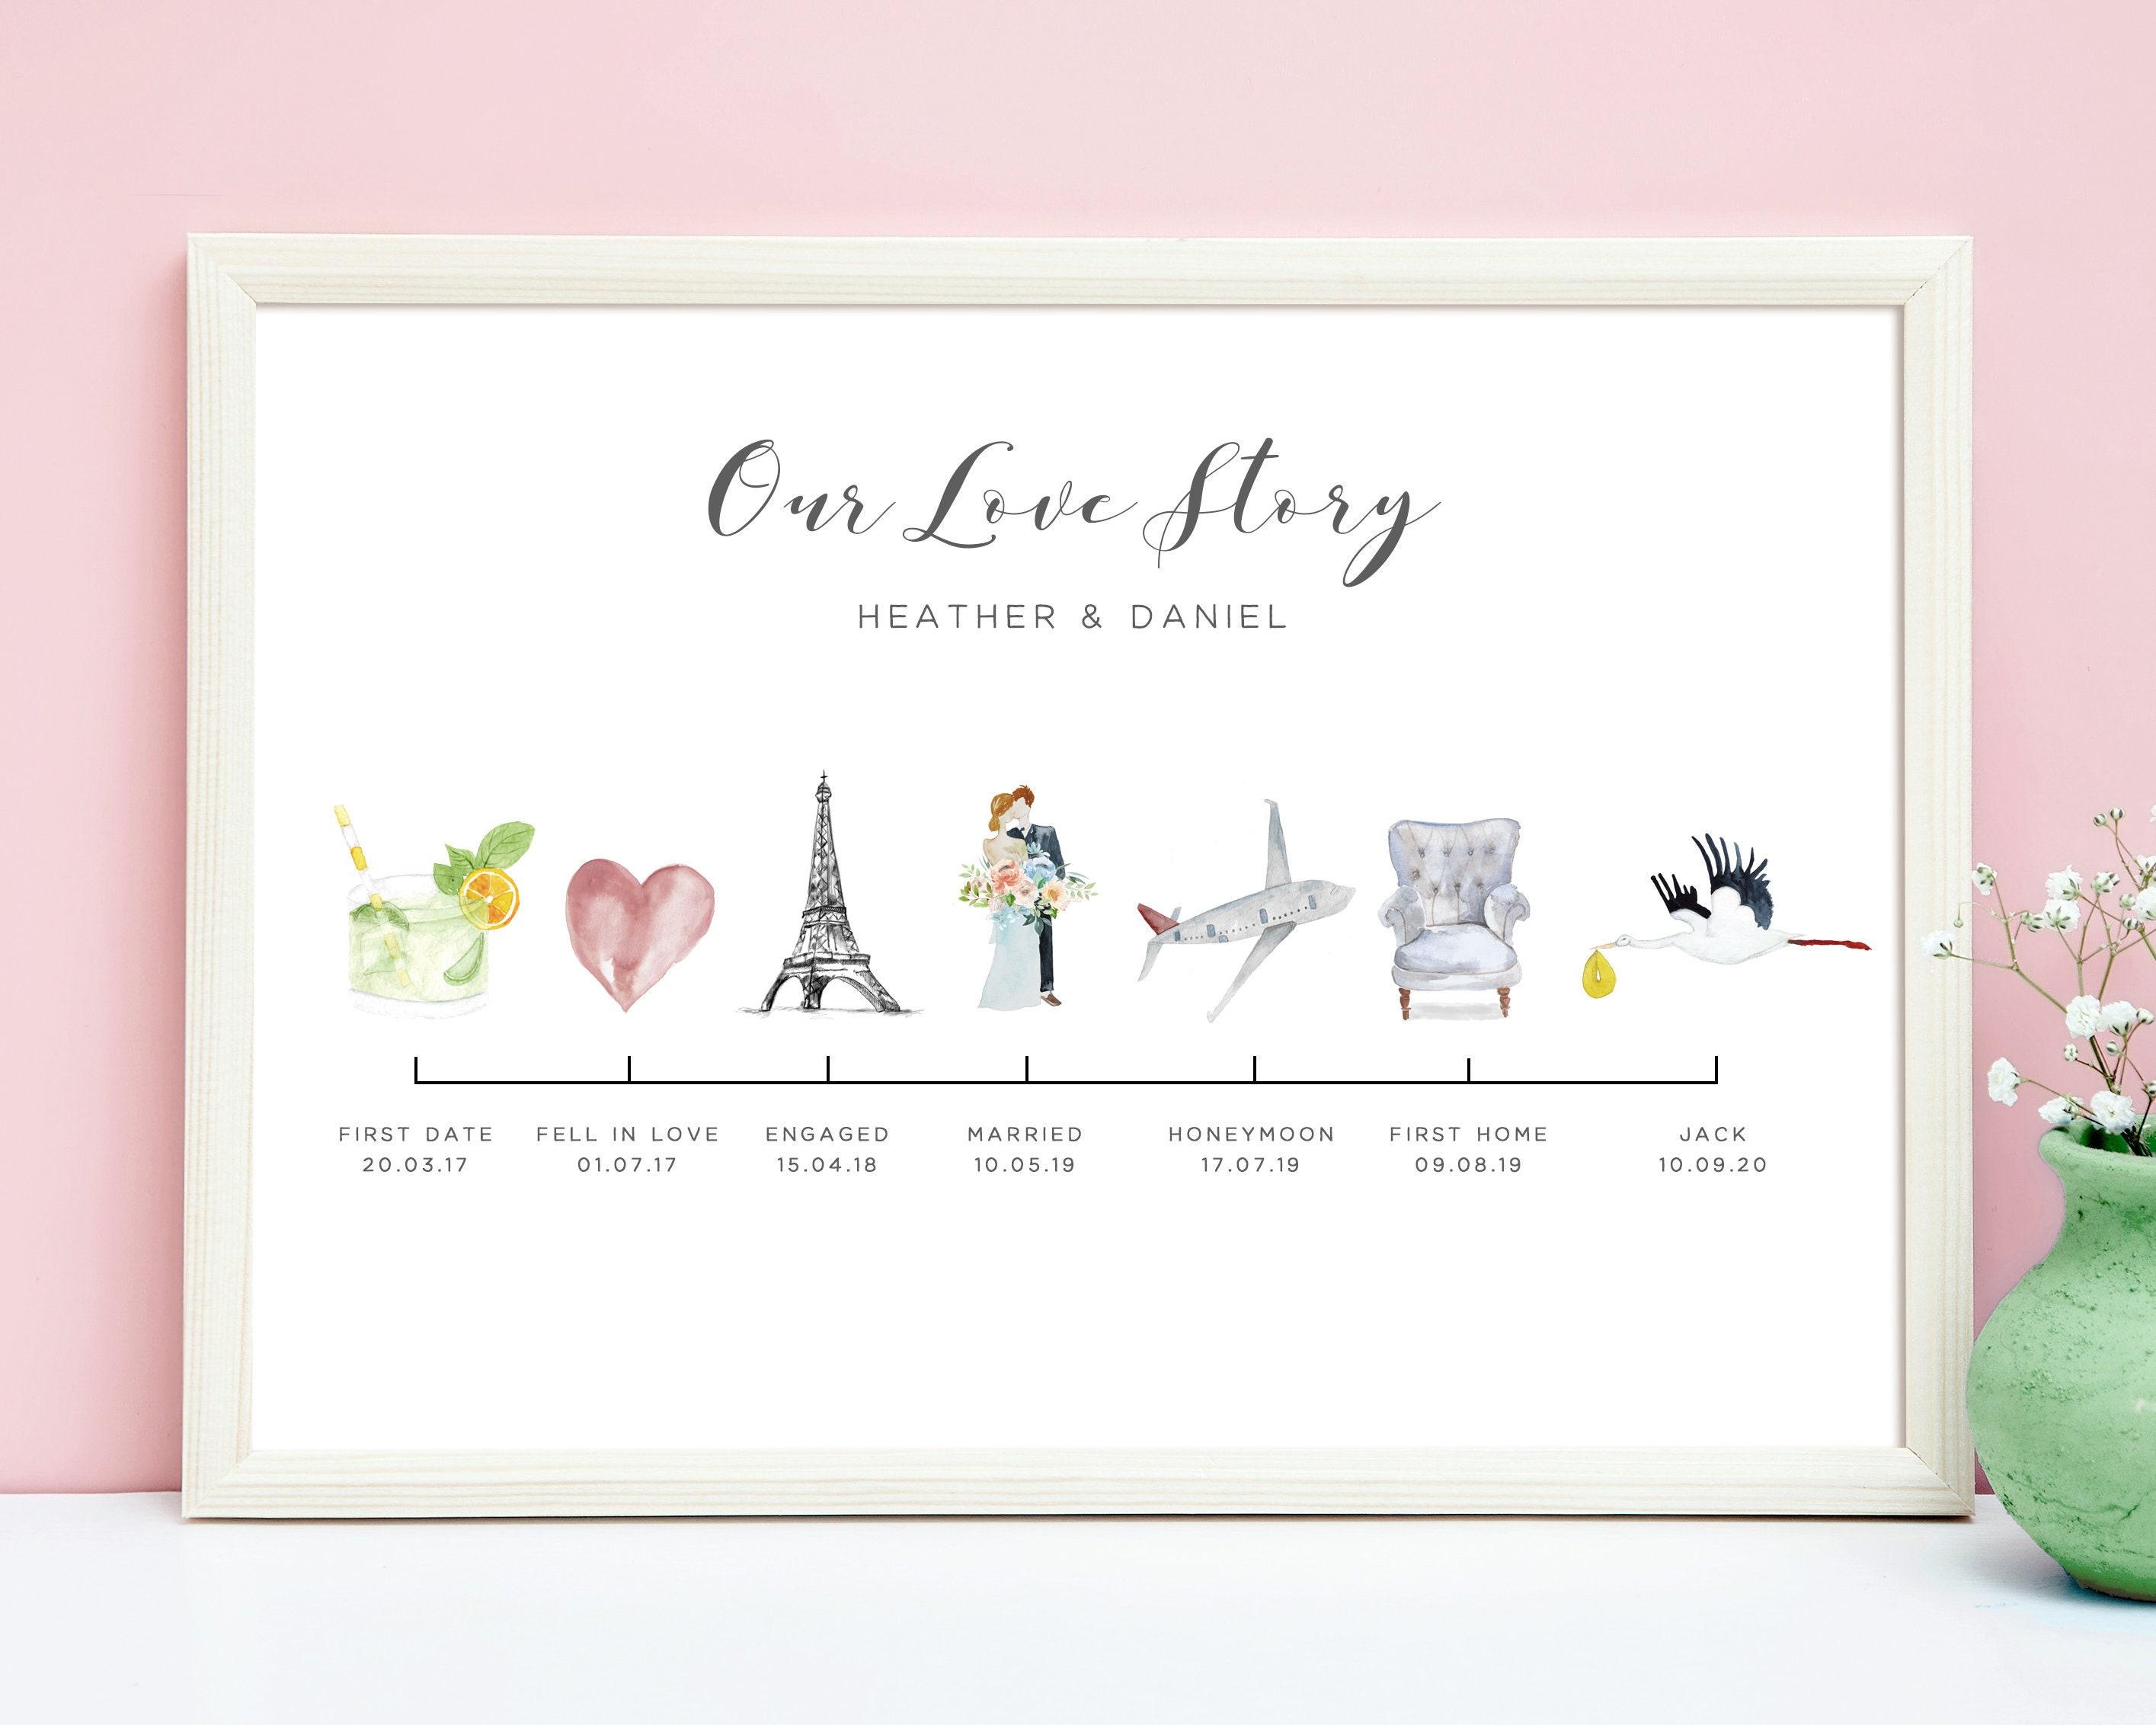 Timeline of relationship milestones